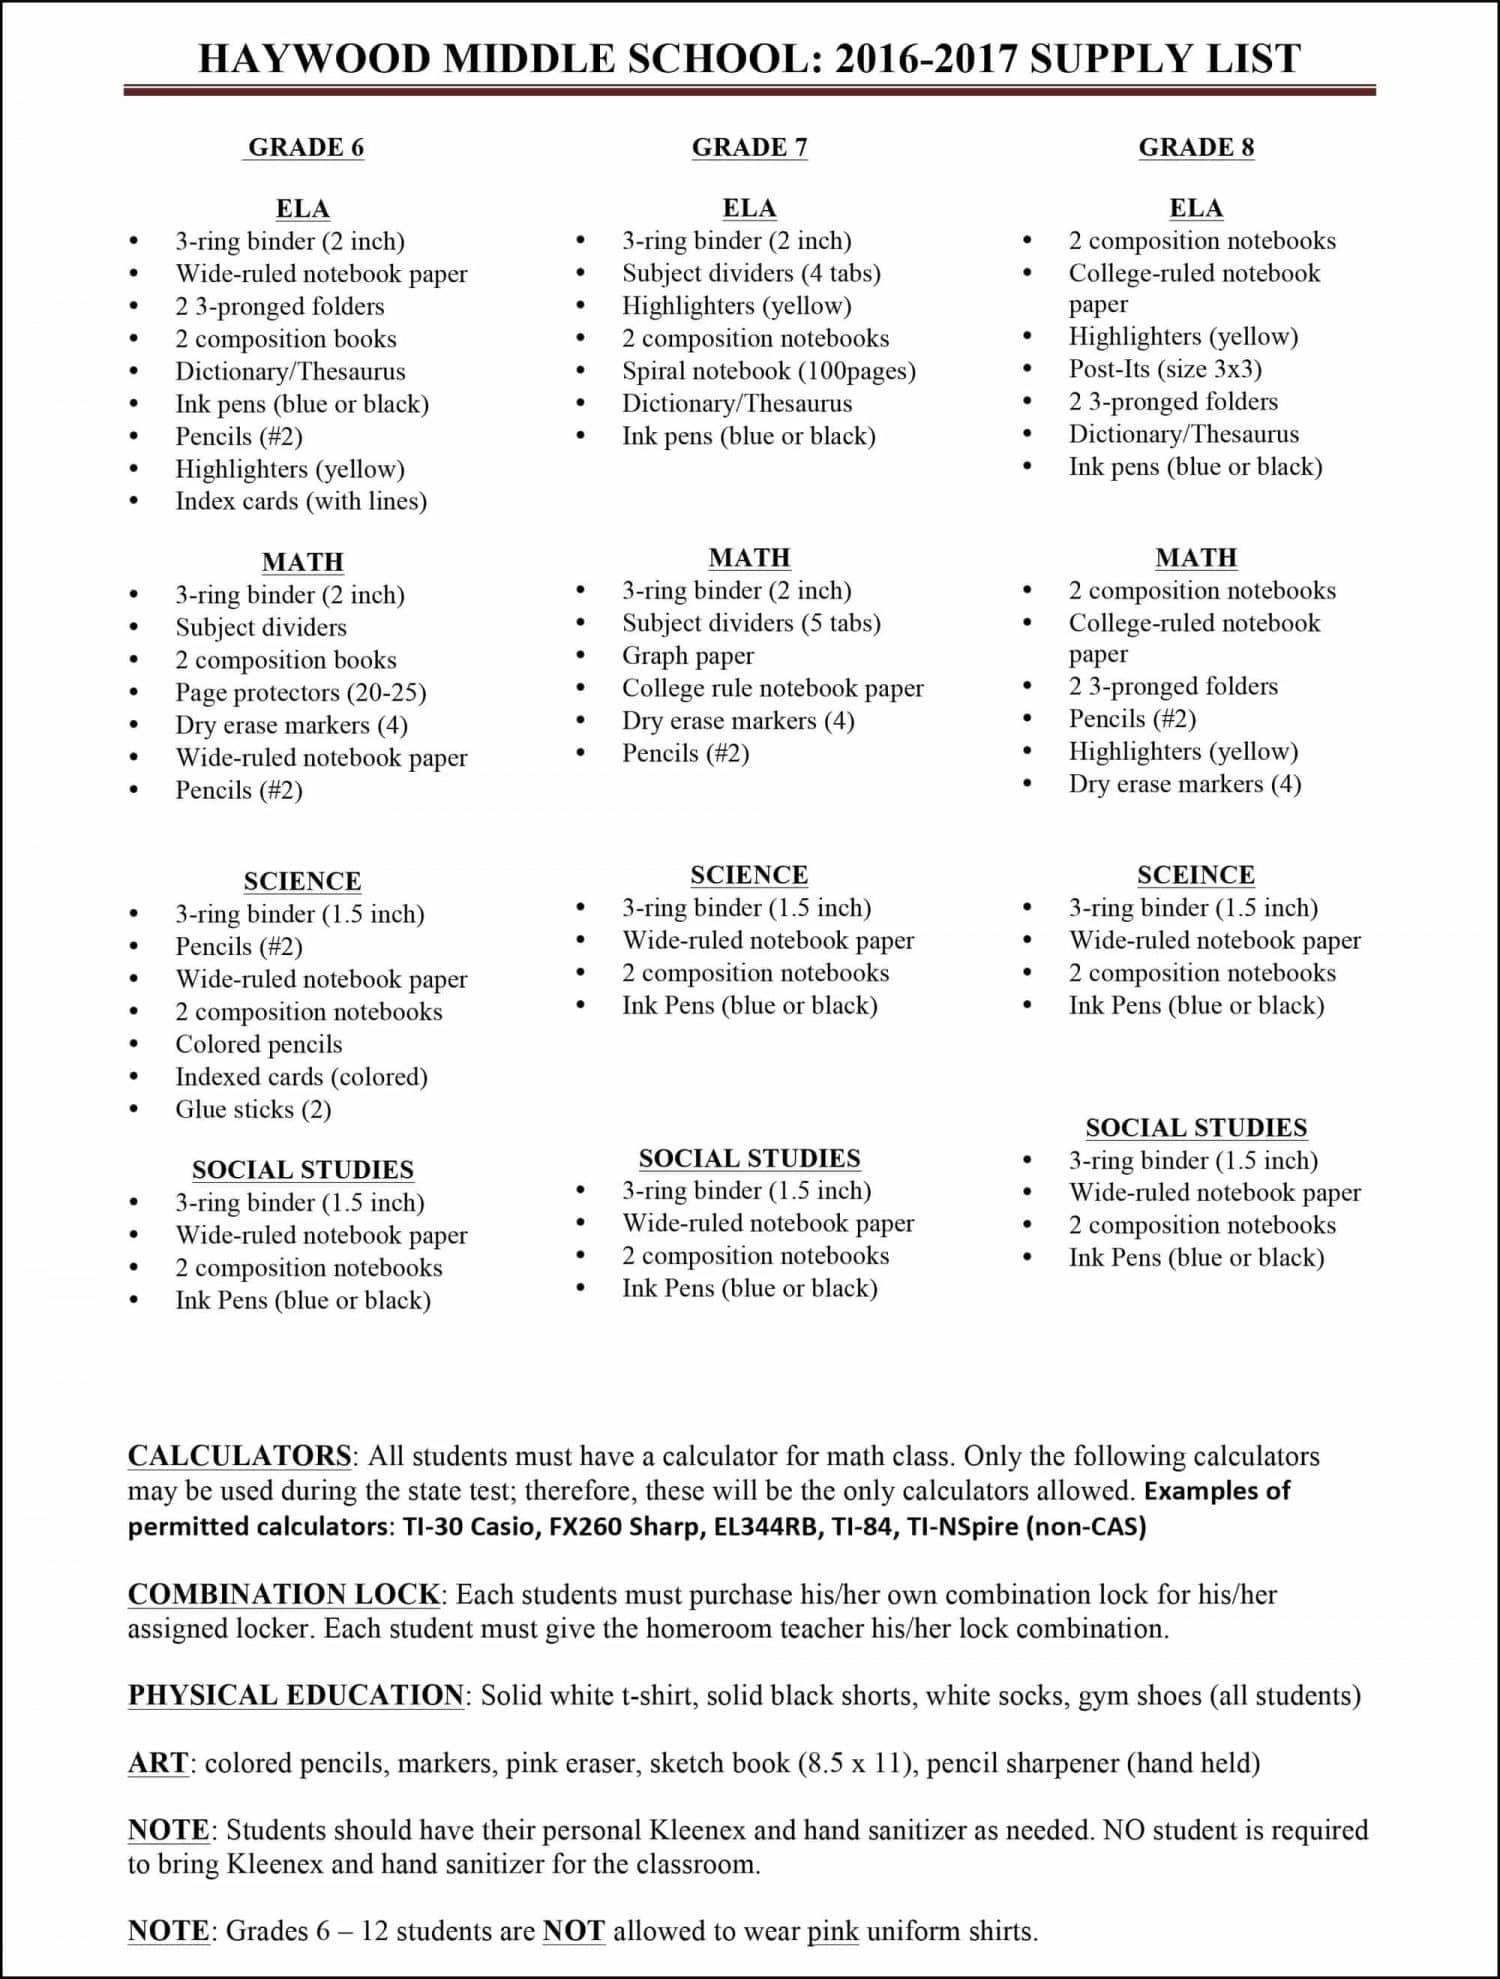 Microsoft Word - HMS Supply List 2016-2017.docx